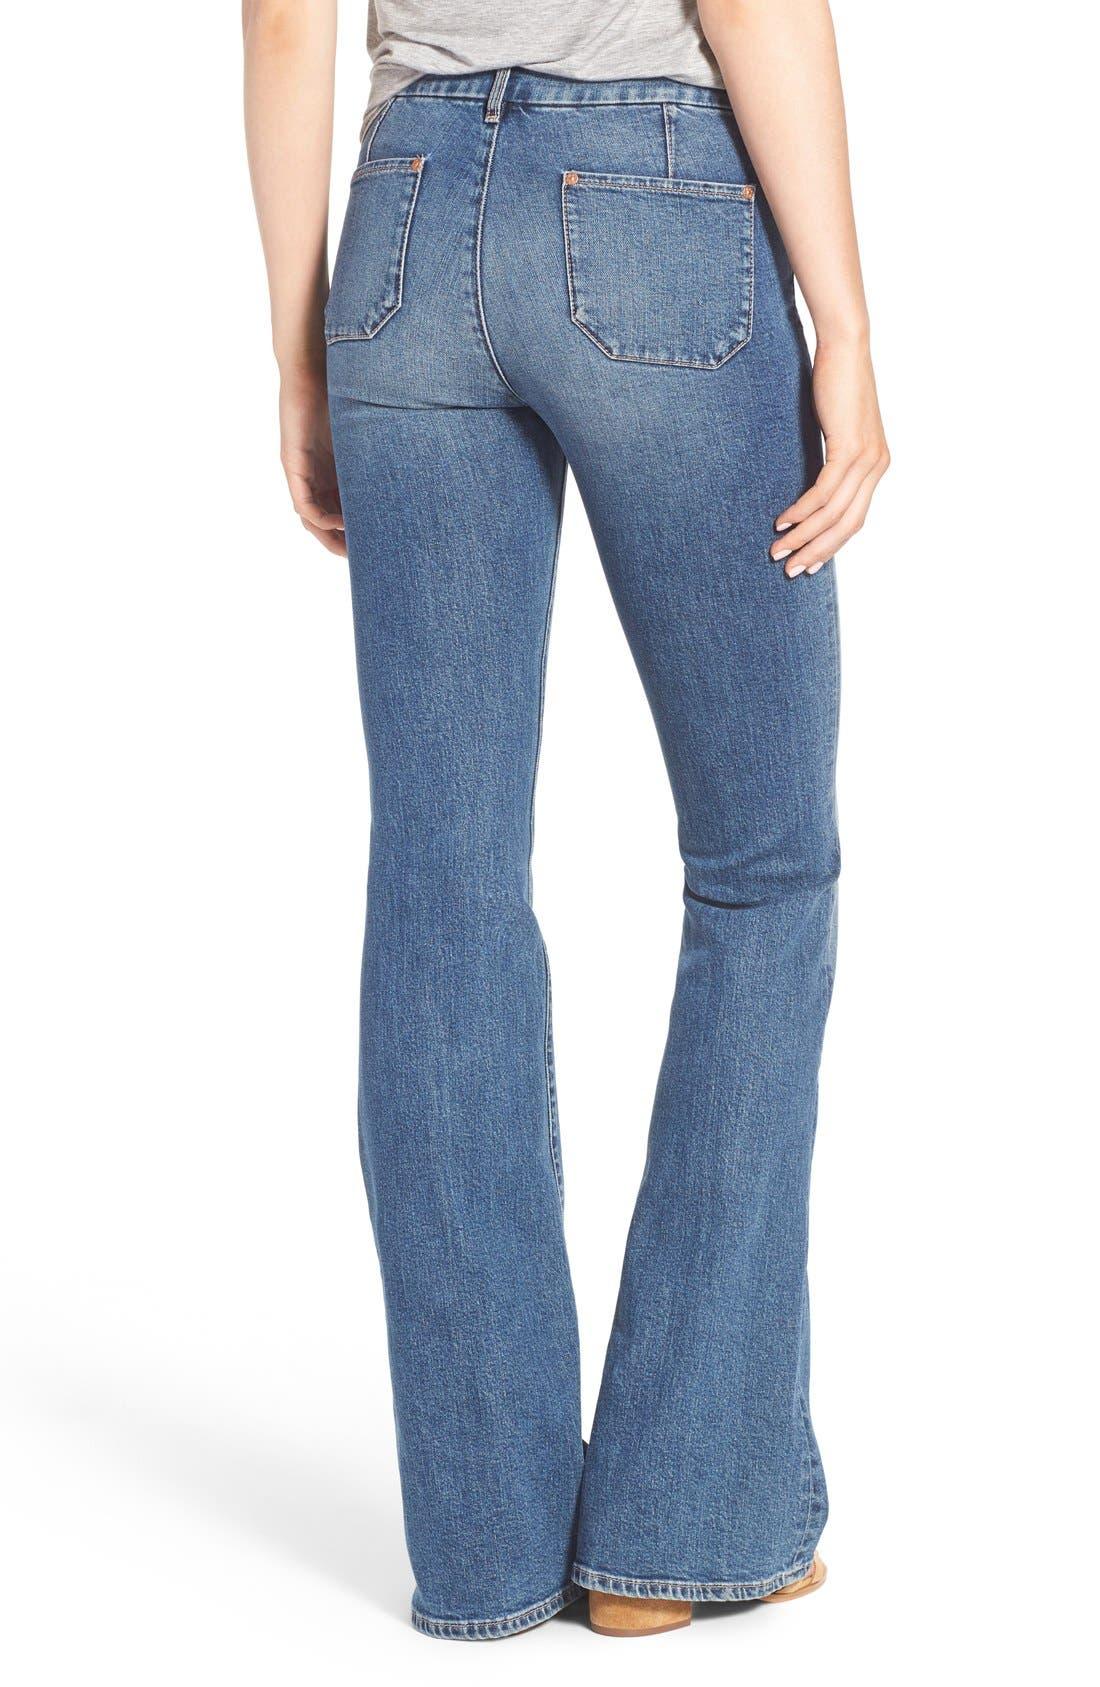 Alternate Image 2  - M.i.h.Jeans 'Marrakesh' Flare Jeans